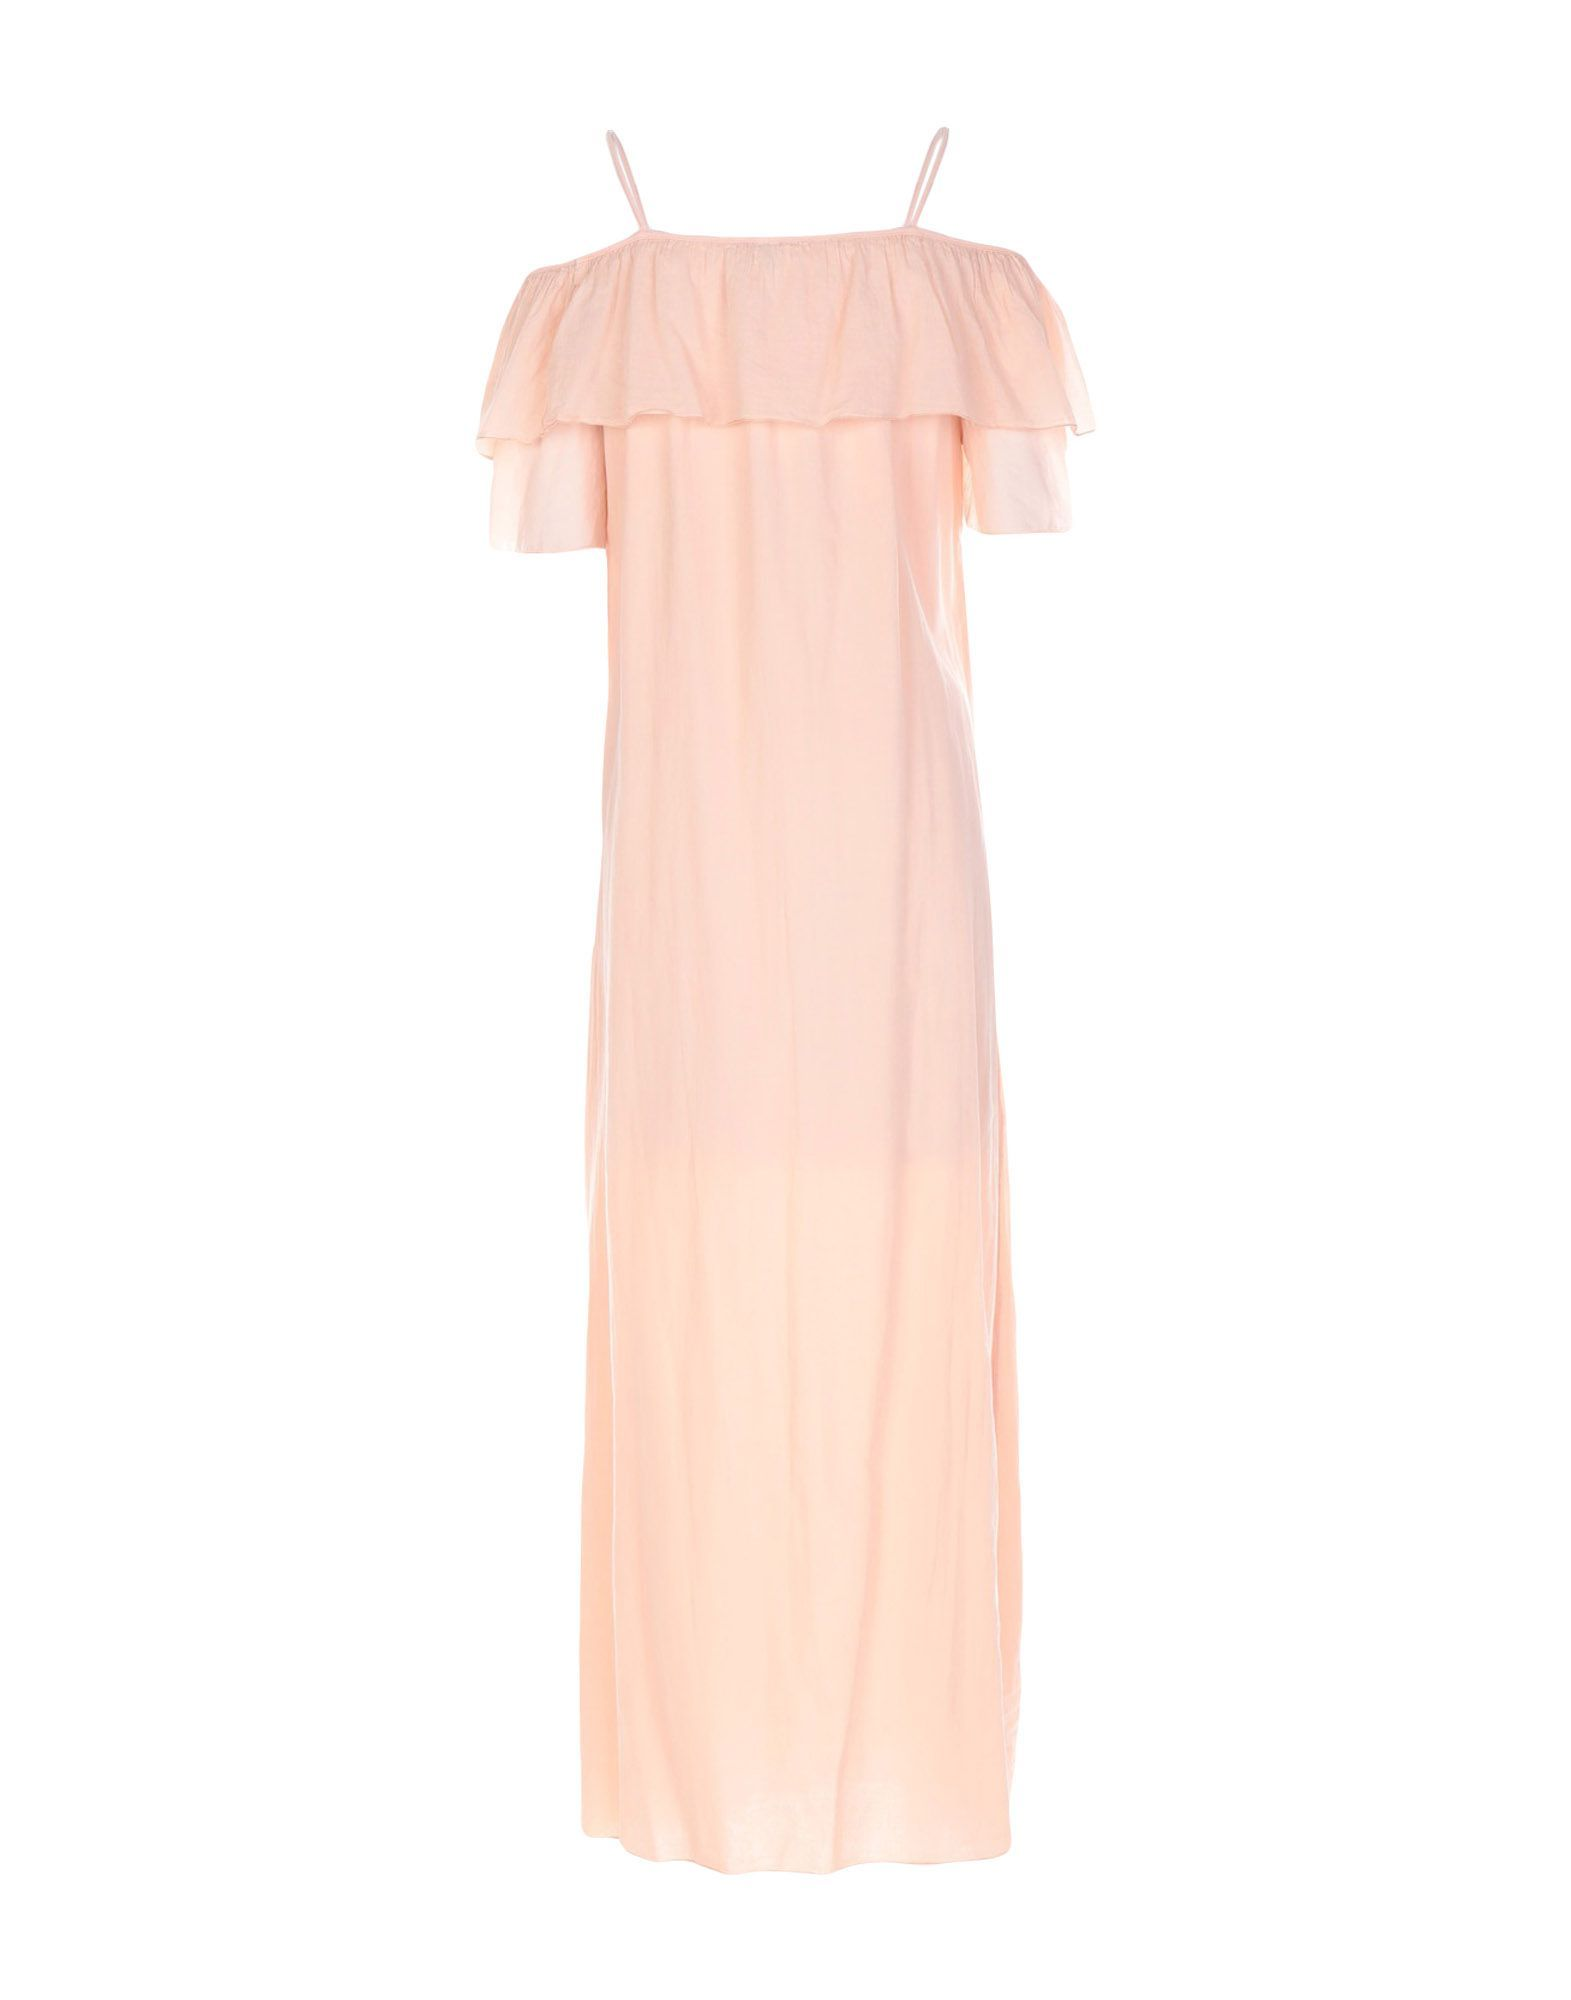 European Culture Apricot Cotton Full Length Dress